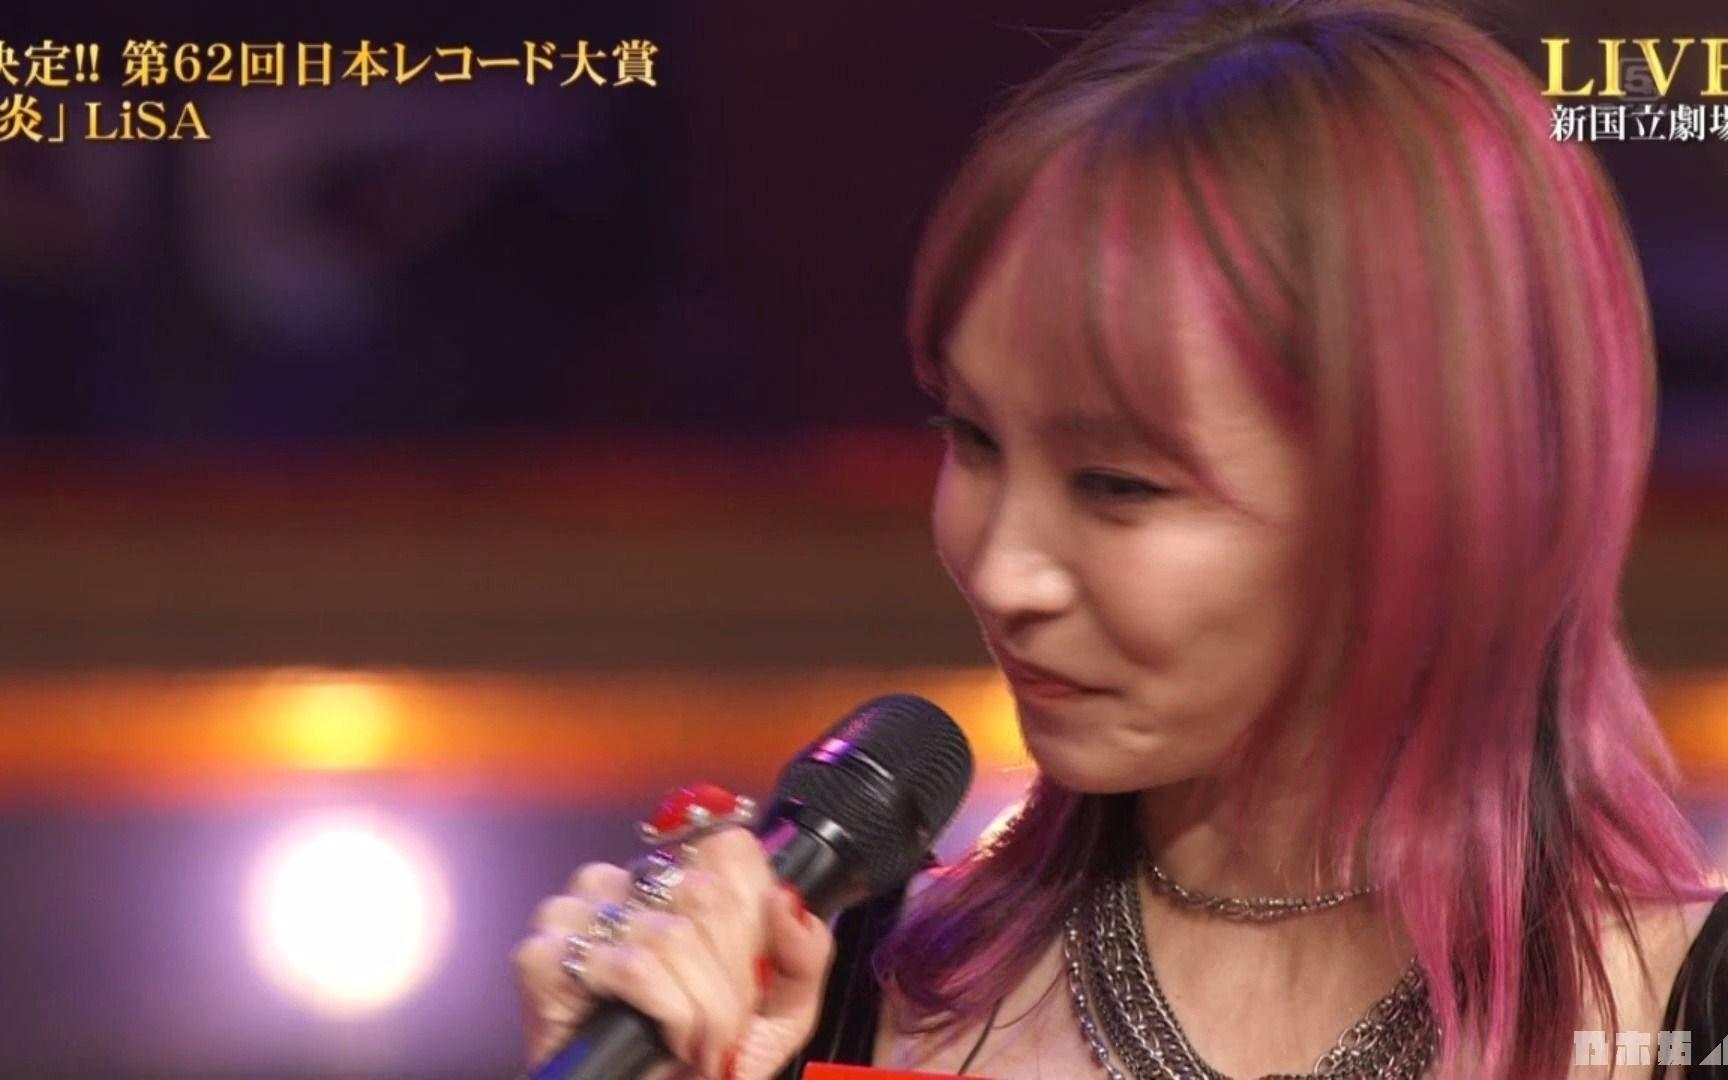 歌唱 力 Lisa